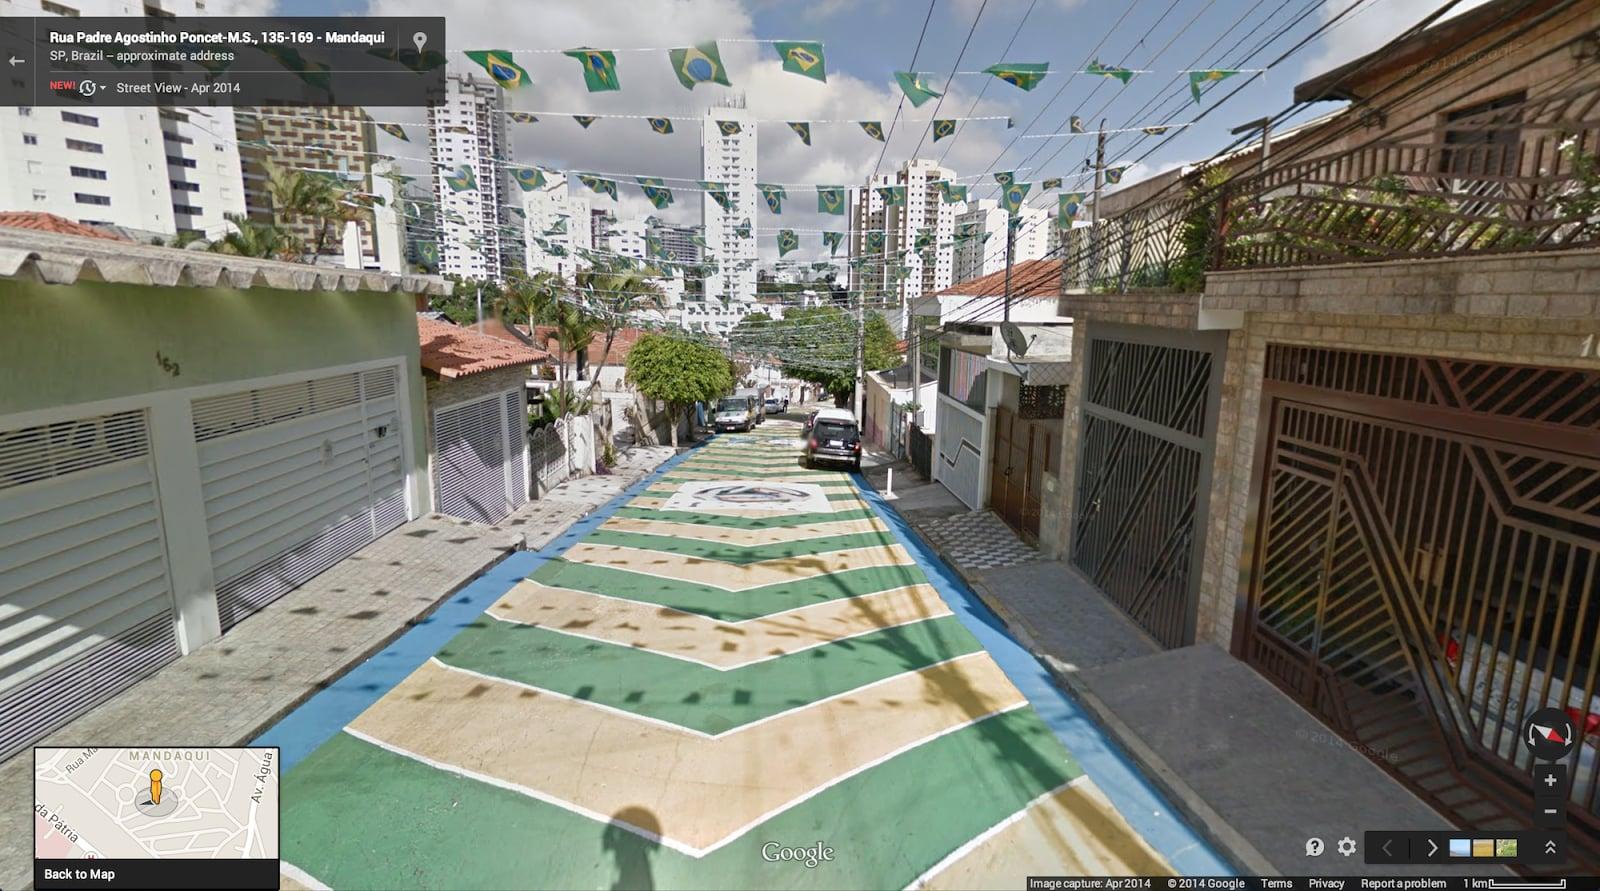 Use Google Maps.